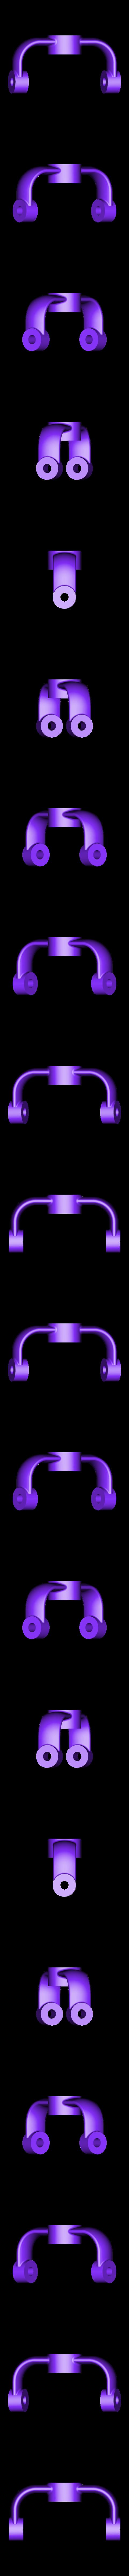 Bell_Crib.STL Download free STL file 4-8-8-4 Big Boy Locomotive • 3D printer object, RaymondDeLuca